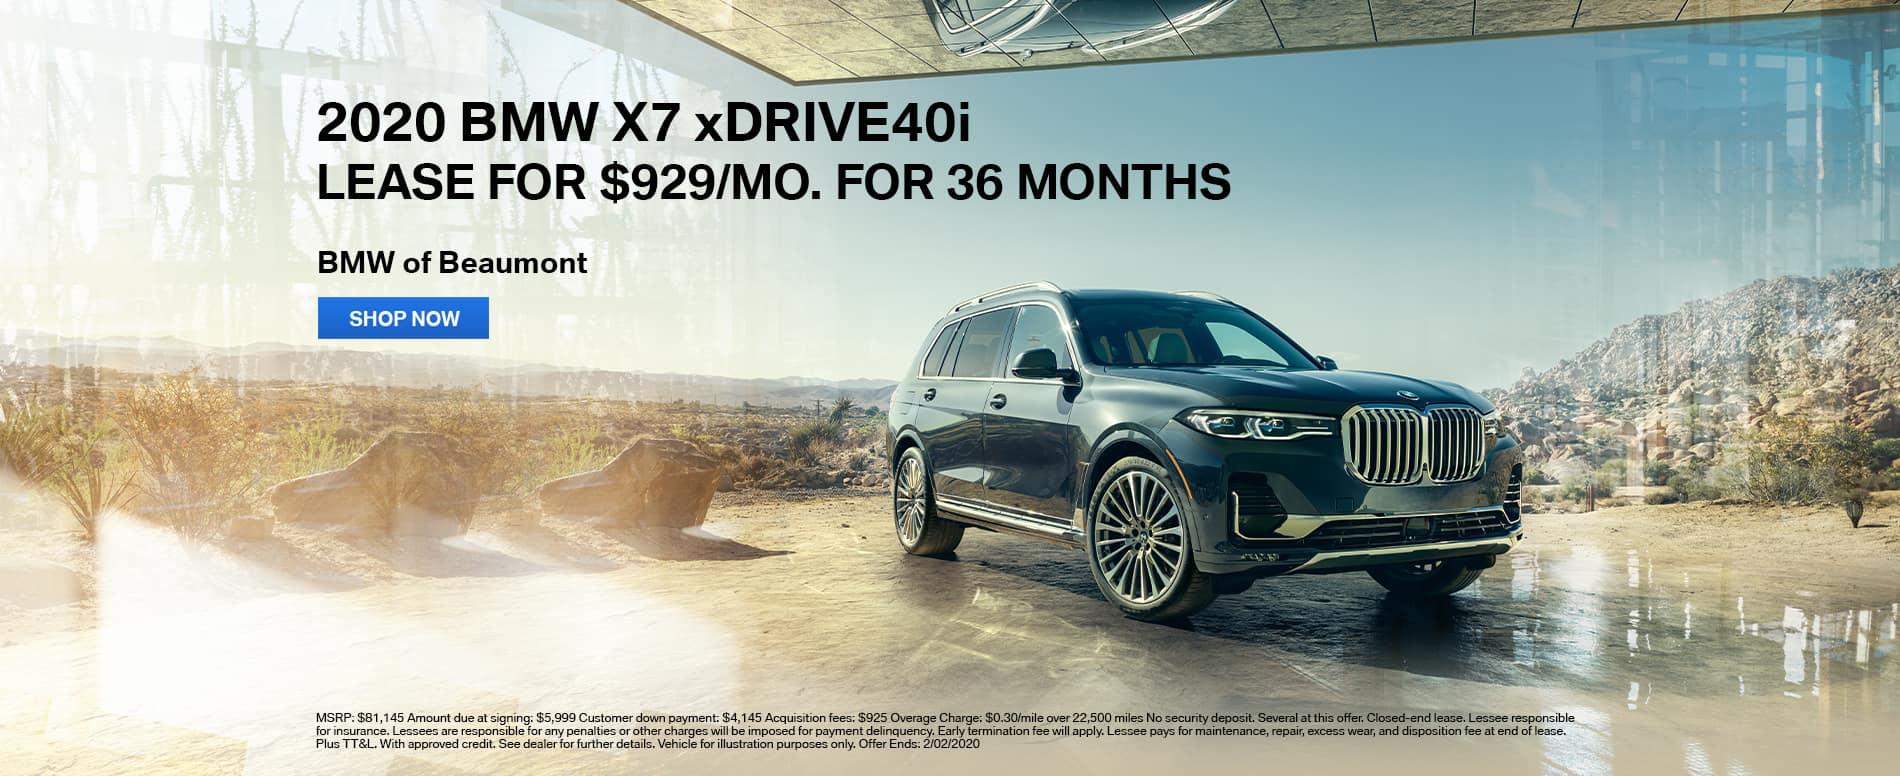 2020 BMW X7 xDrive40i lease Beaumont